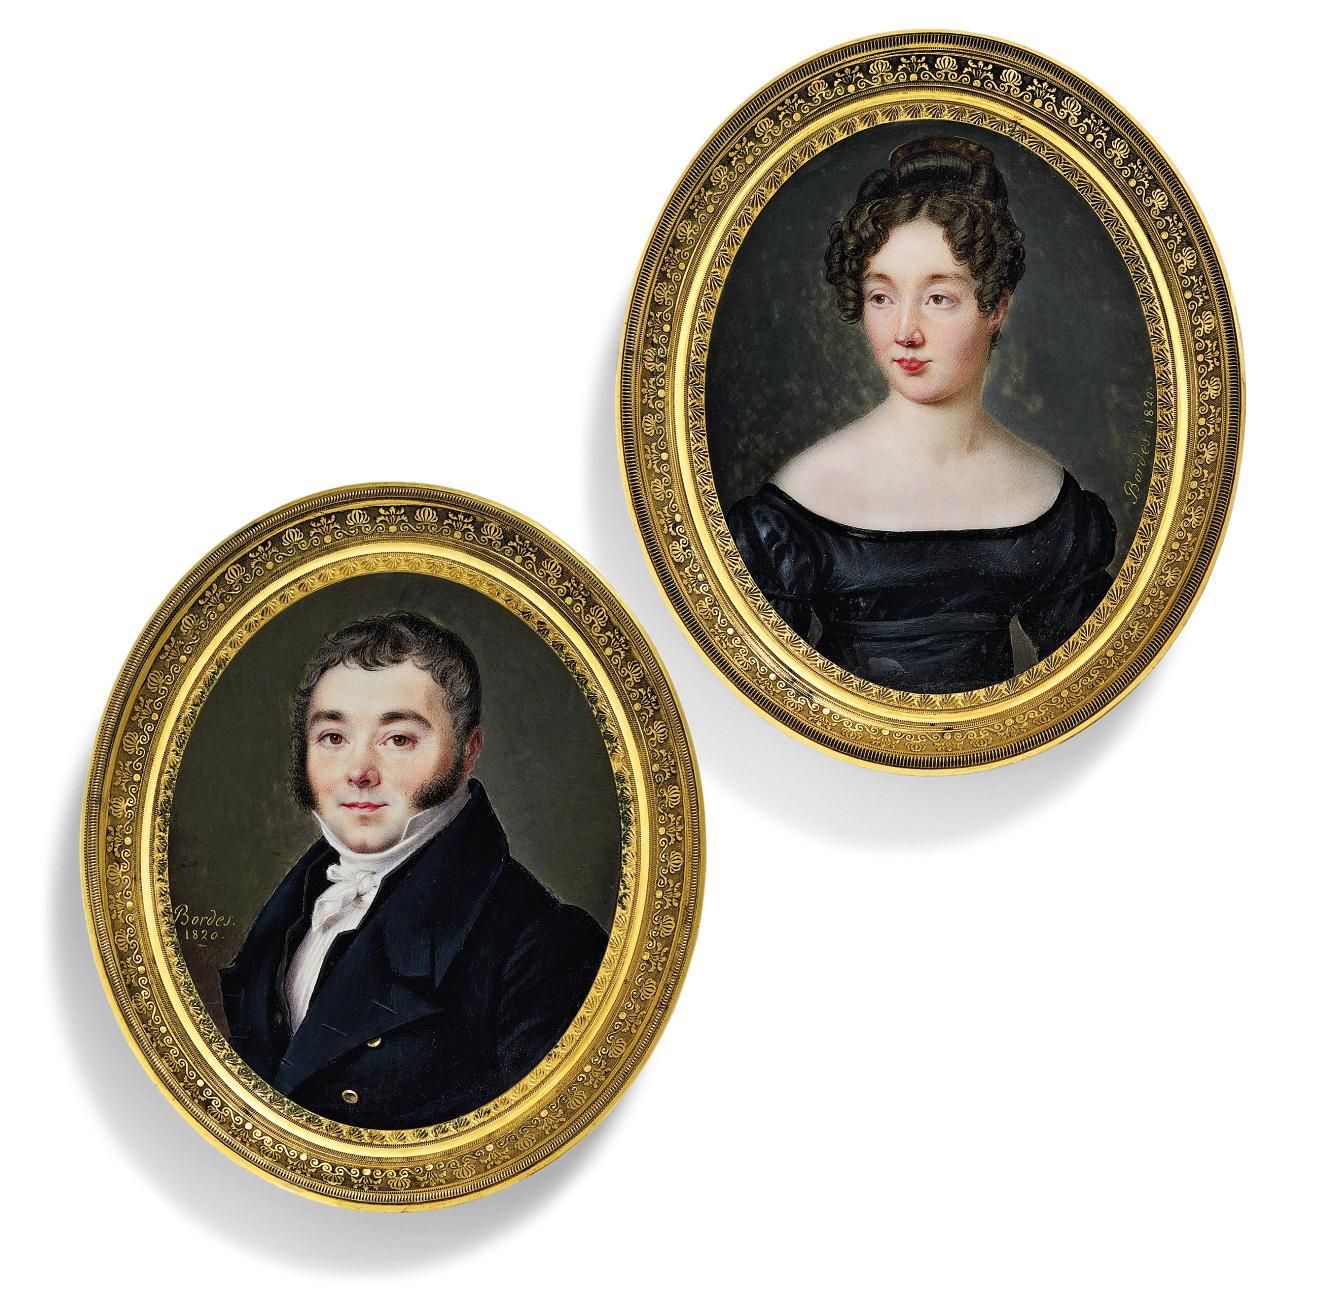 JOSEPH BORDES (FRENCH, 1773 - AFTER 1835)